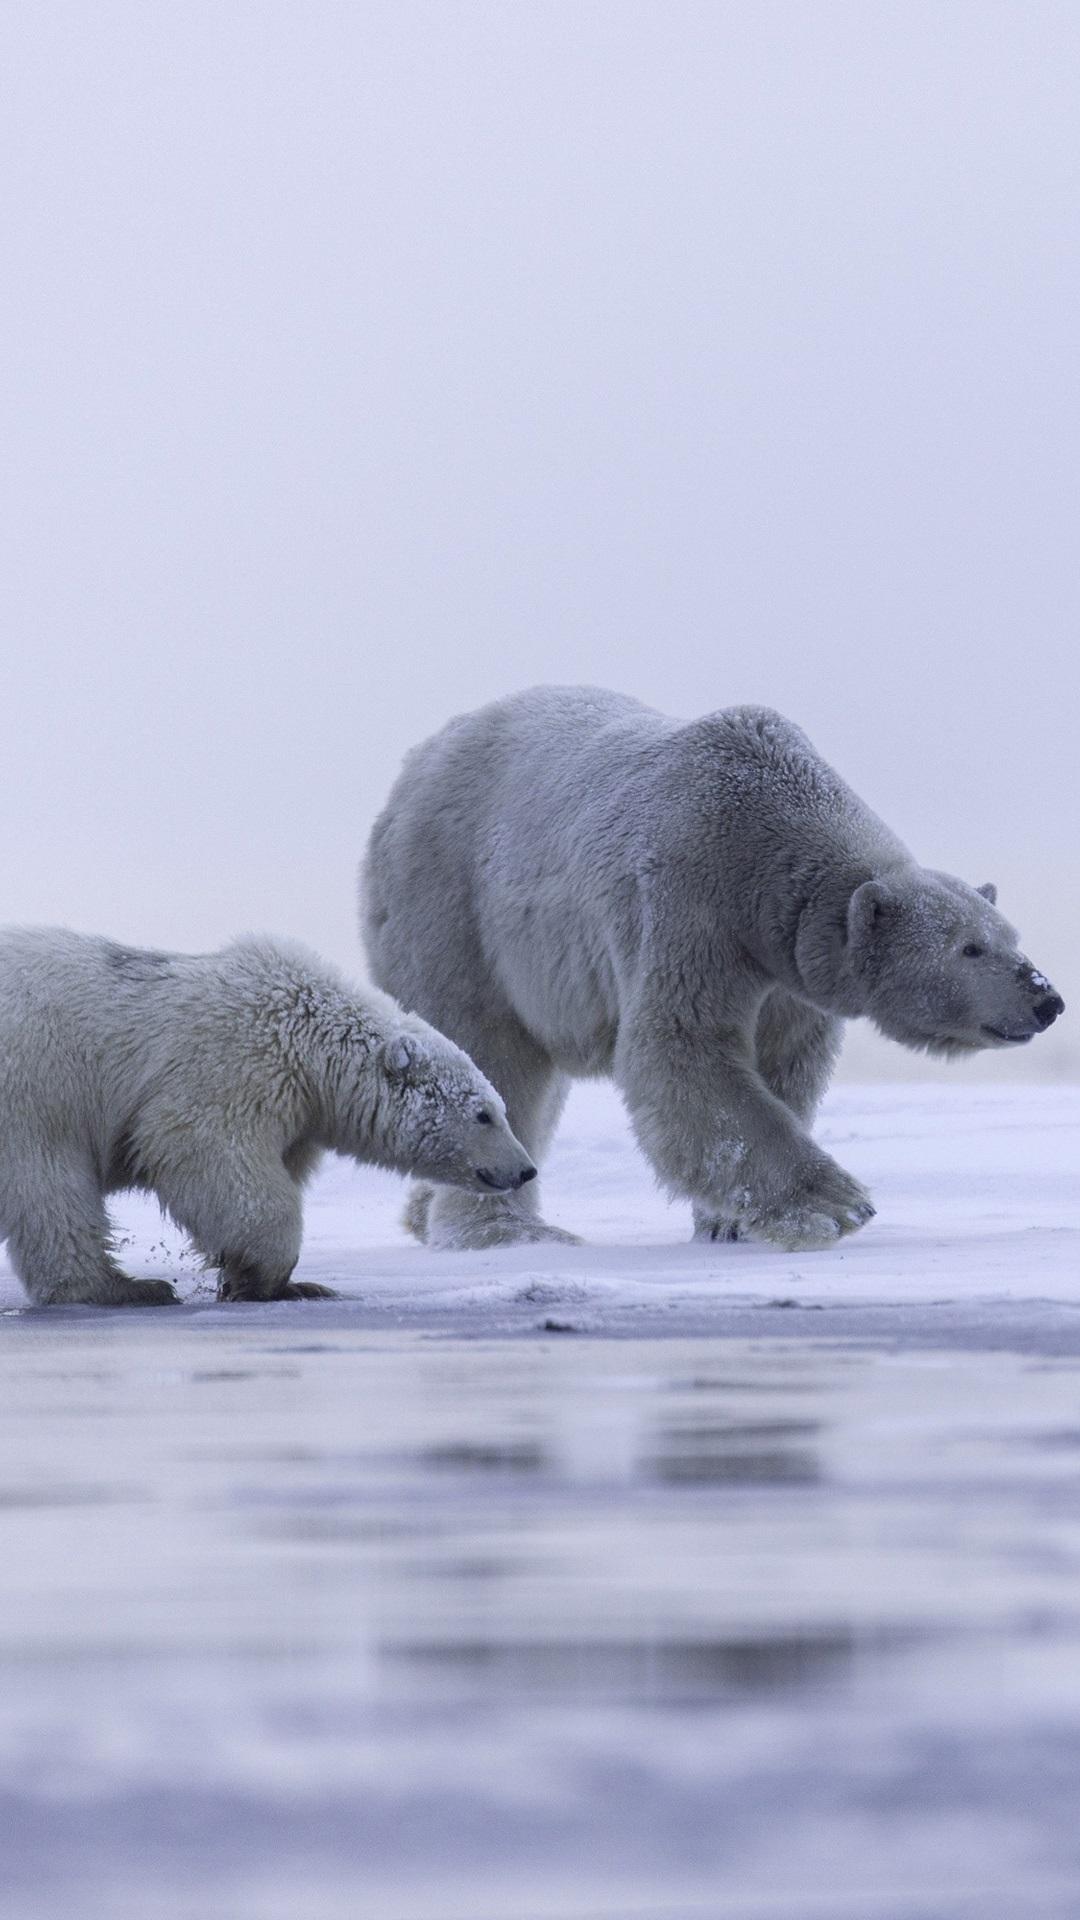 Alaska-polar-bear-family-ice-snow-iPhone-S-Plus-1080x1920-wallpaper-wp3602335